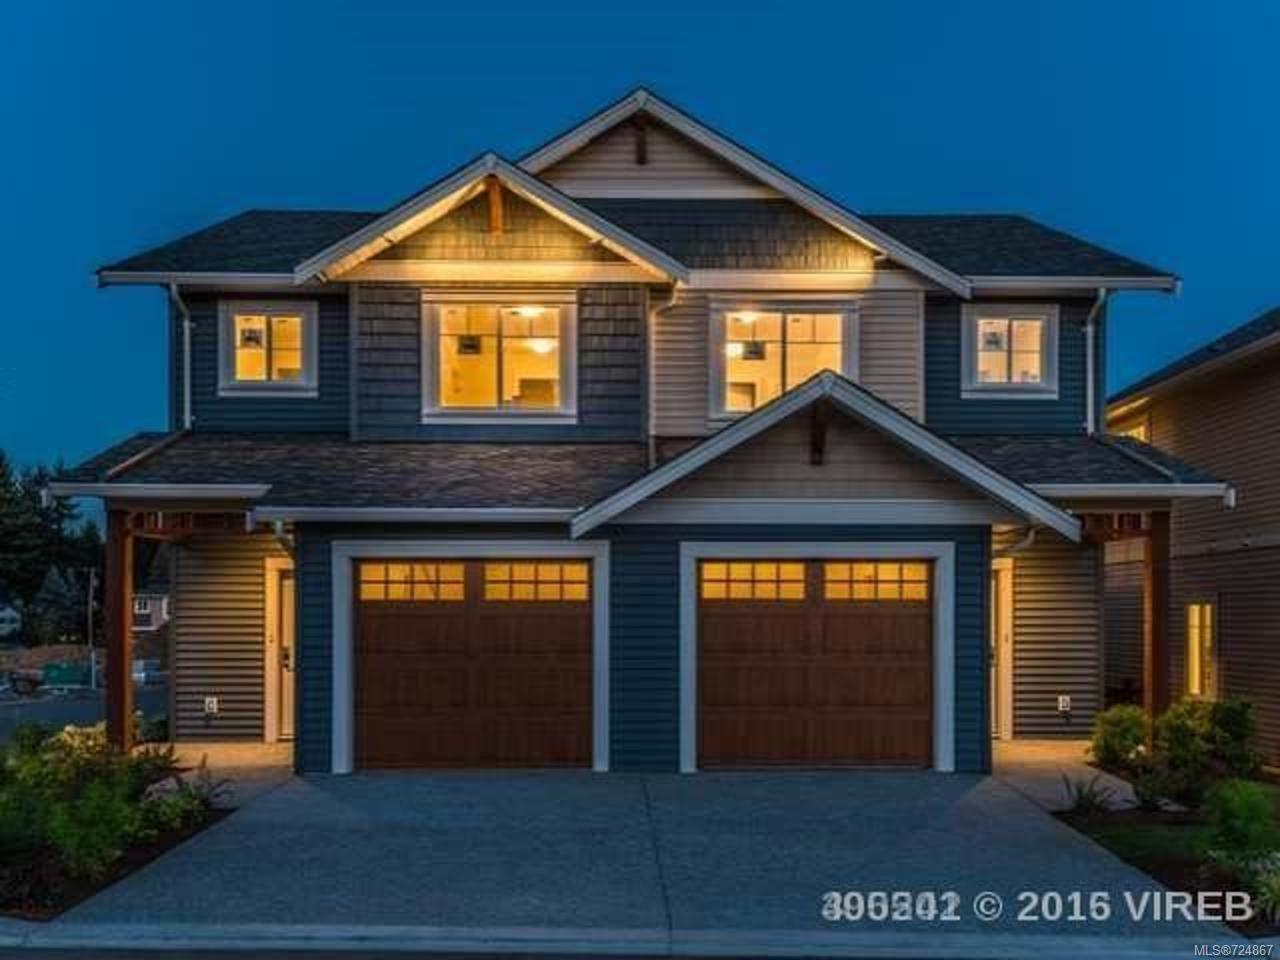 Main Photo: 163 1720 Dufferin Cres in NANAIMO: Na Central Nanaimo Row/Townhouse for sale (Nanaimo)  : MLS®# 724867